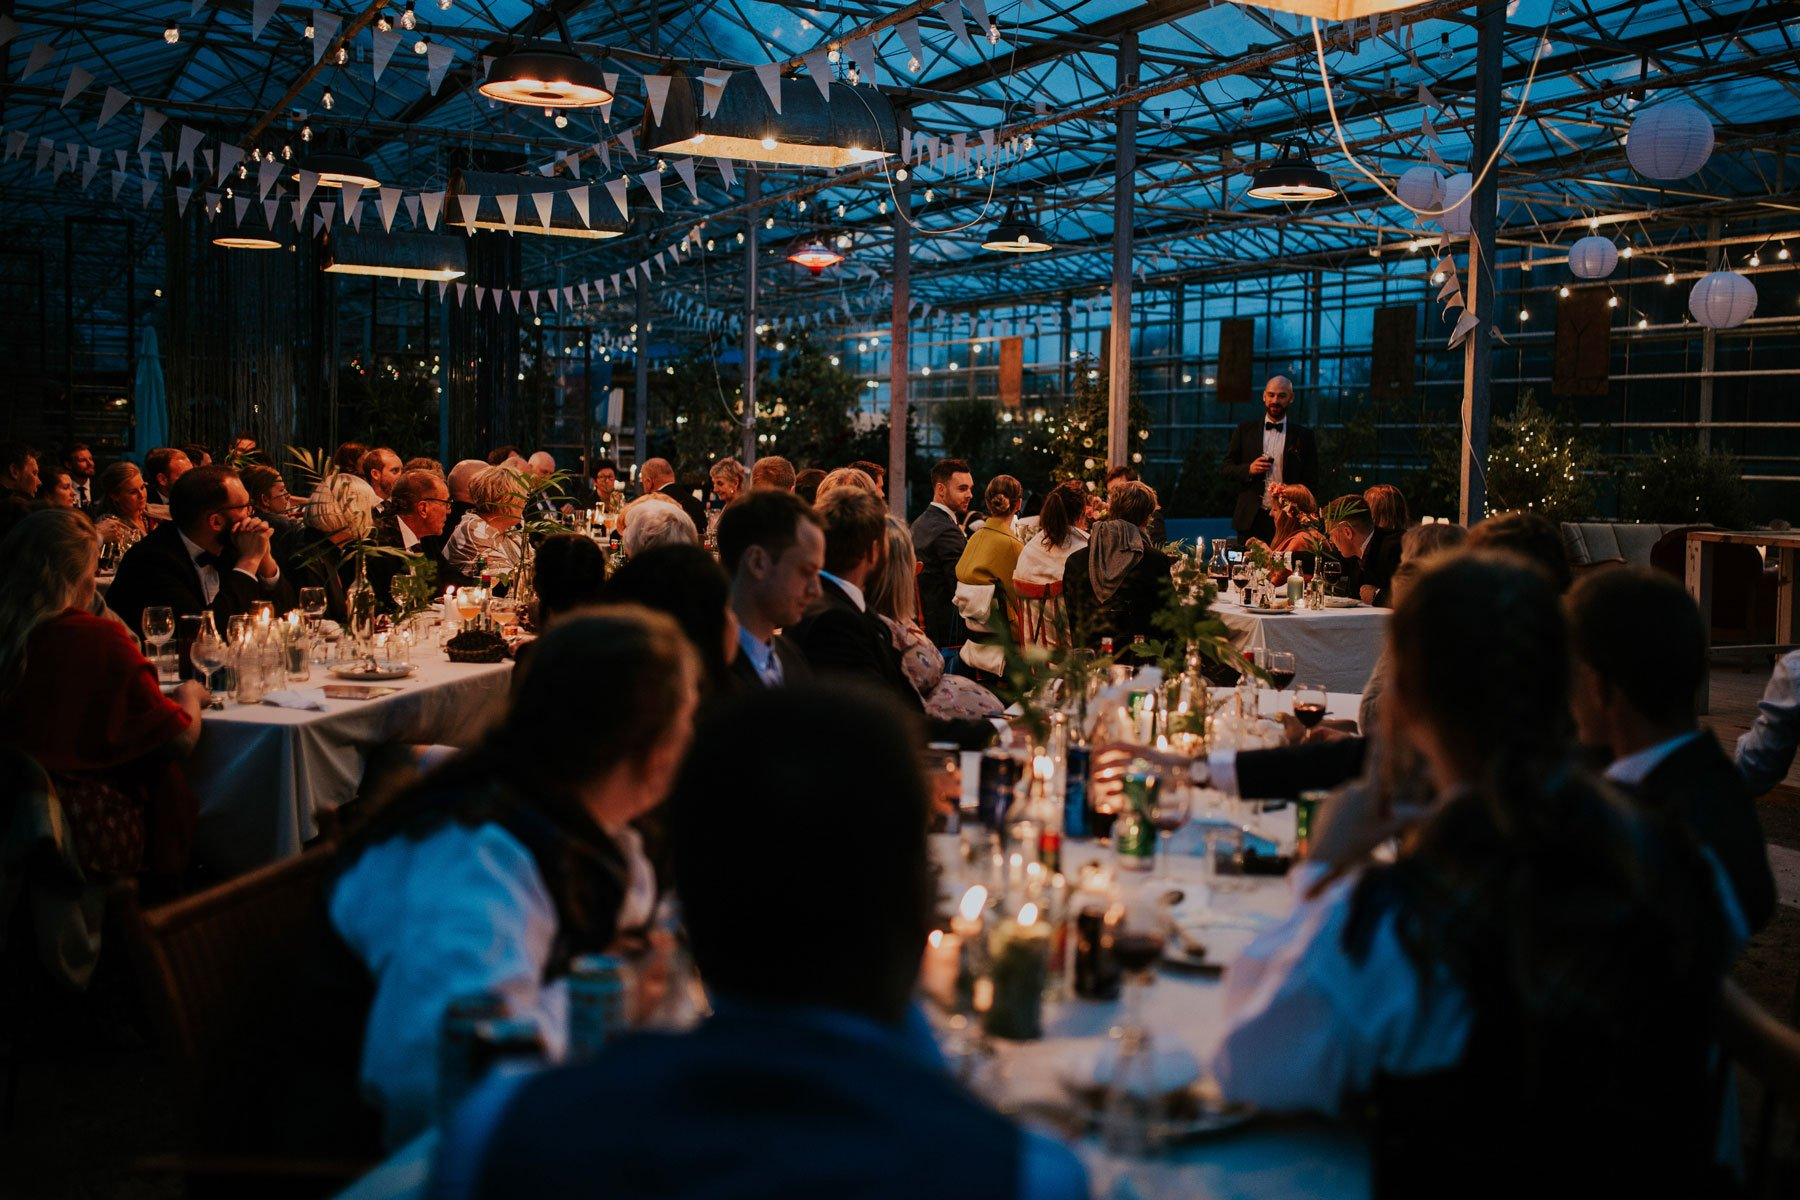 evening norwegian wedding lineowrenfotografi tuvamats